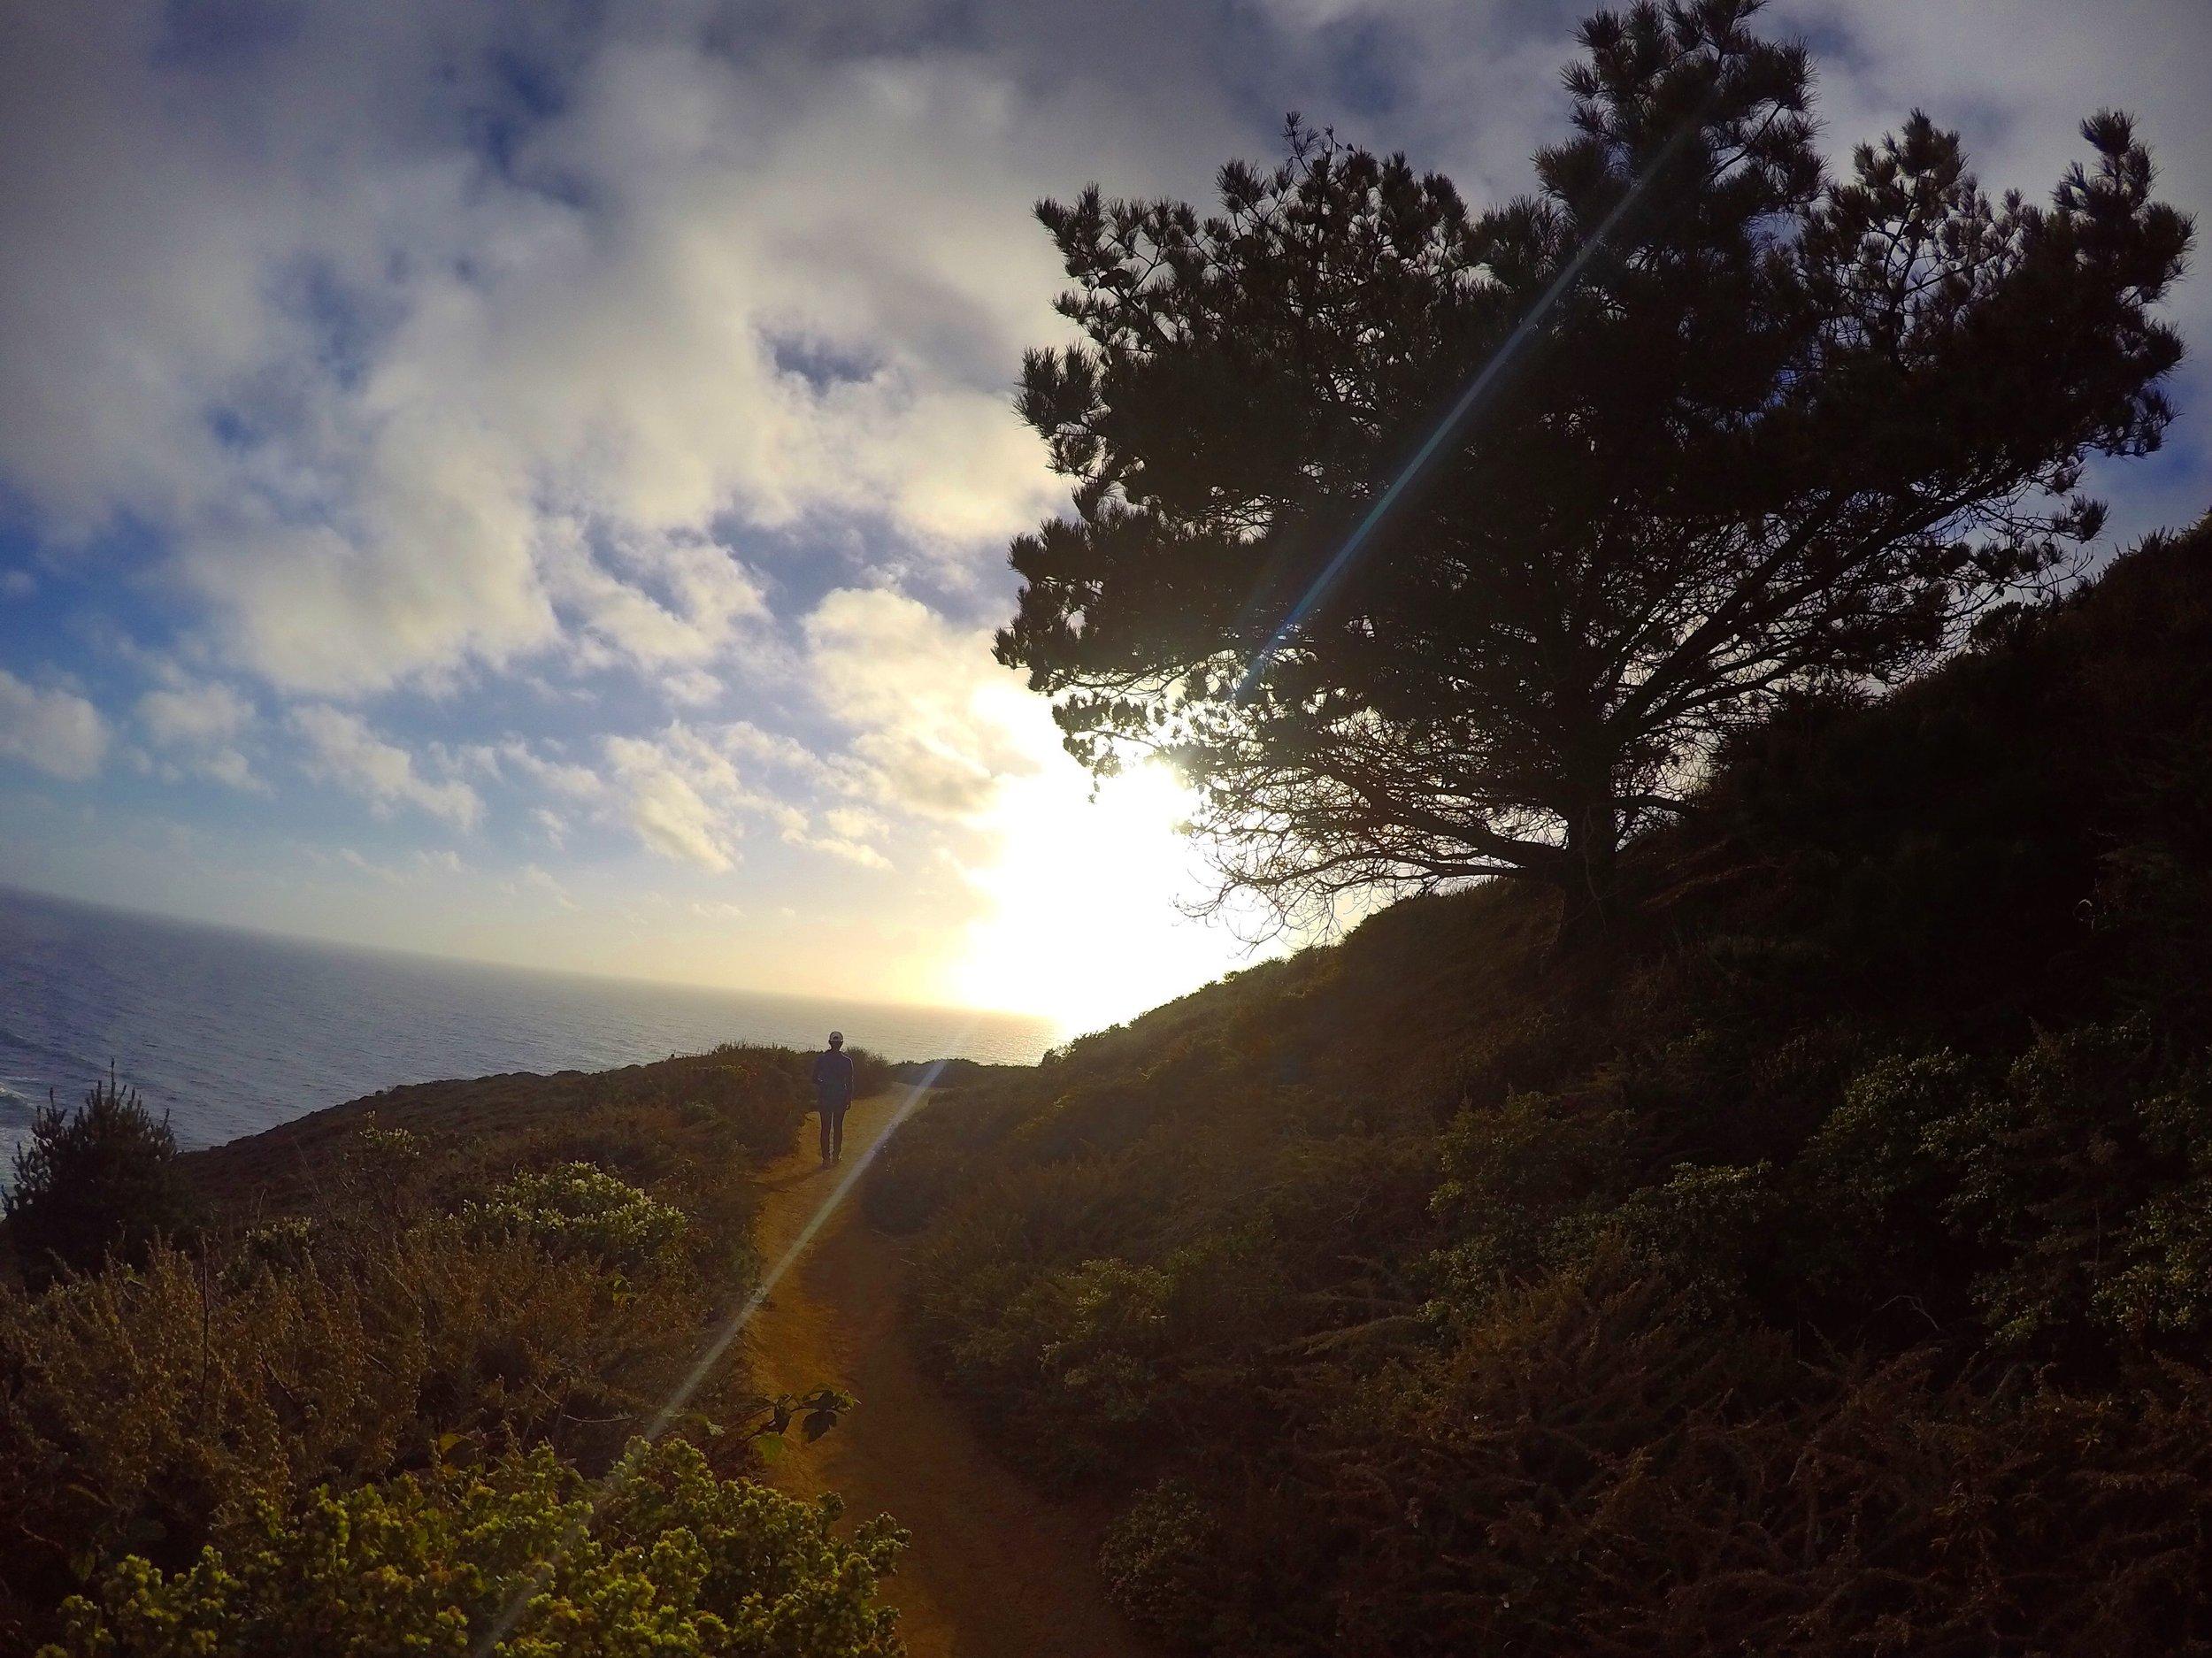 Montara Mountain Trail, Pacifica